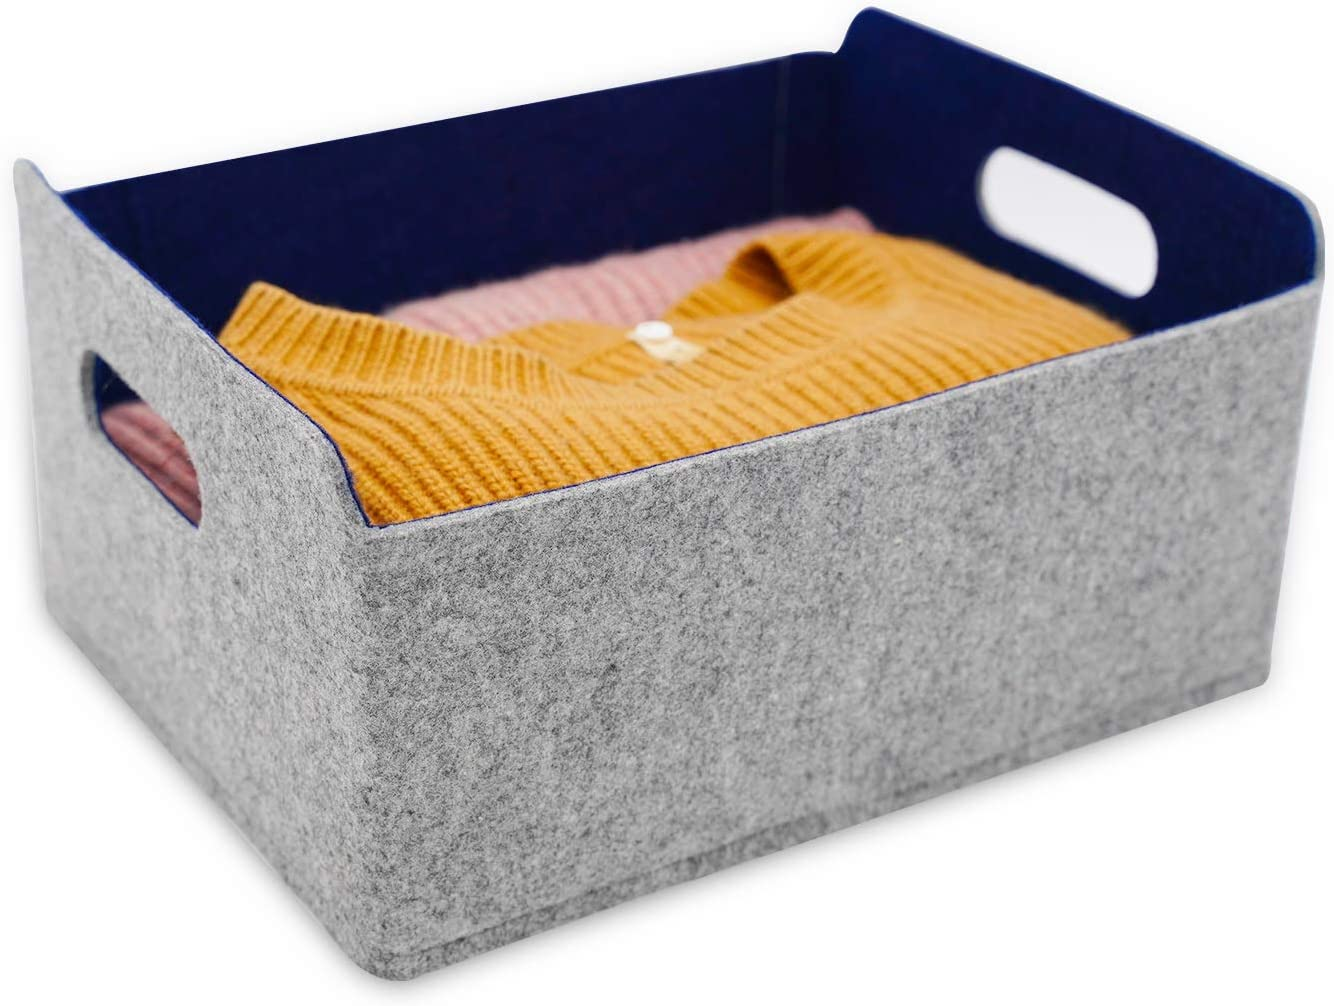 WELAXY storage baskets Felt Foldable Storage Cube bin Shelf Bins Organizer Felt box for for Kids Toys Magazine Books Clothes for Office Bedroom Closet Babies Nursery Laundry organizing (Navy)